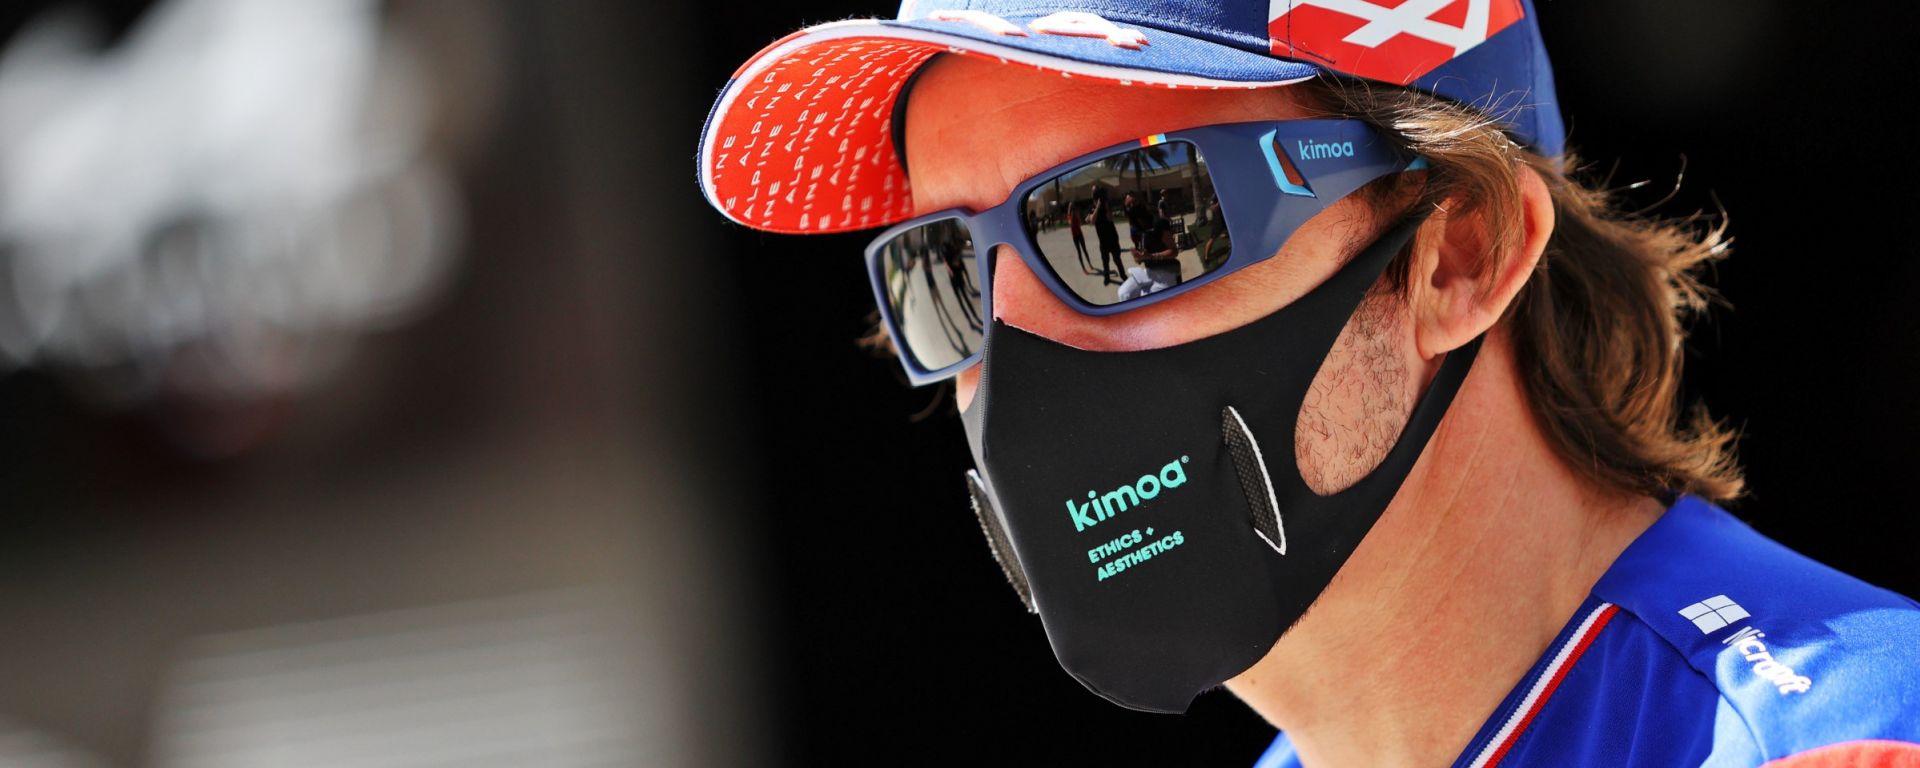 F1, test Bahrain 2021: Fernando Alonso (Alpine) con la mascherina Kimoa